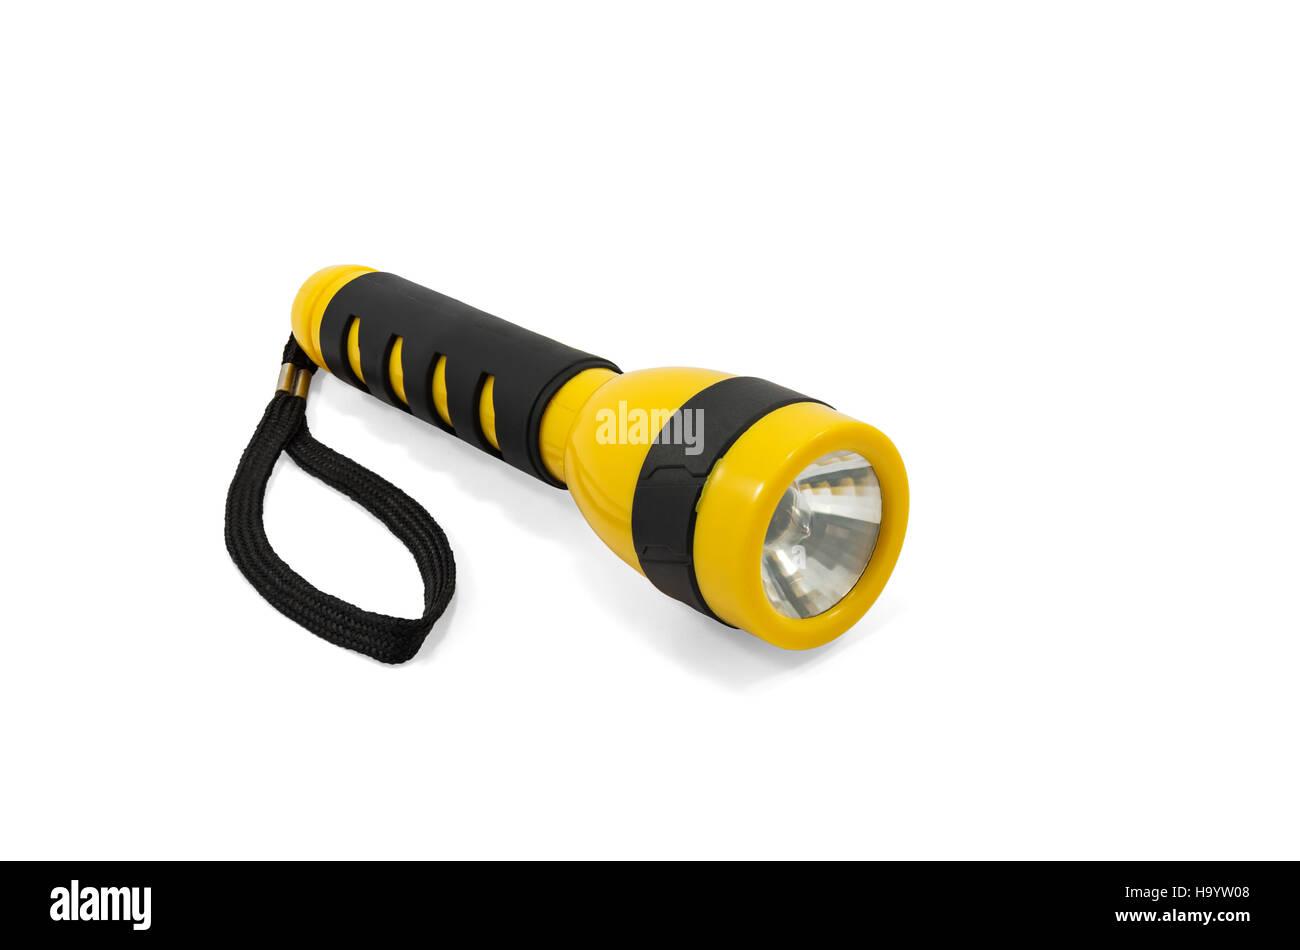 Yellow and black pocket electric flashlight isolated on white background - Stock Image